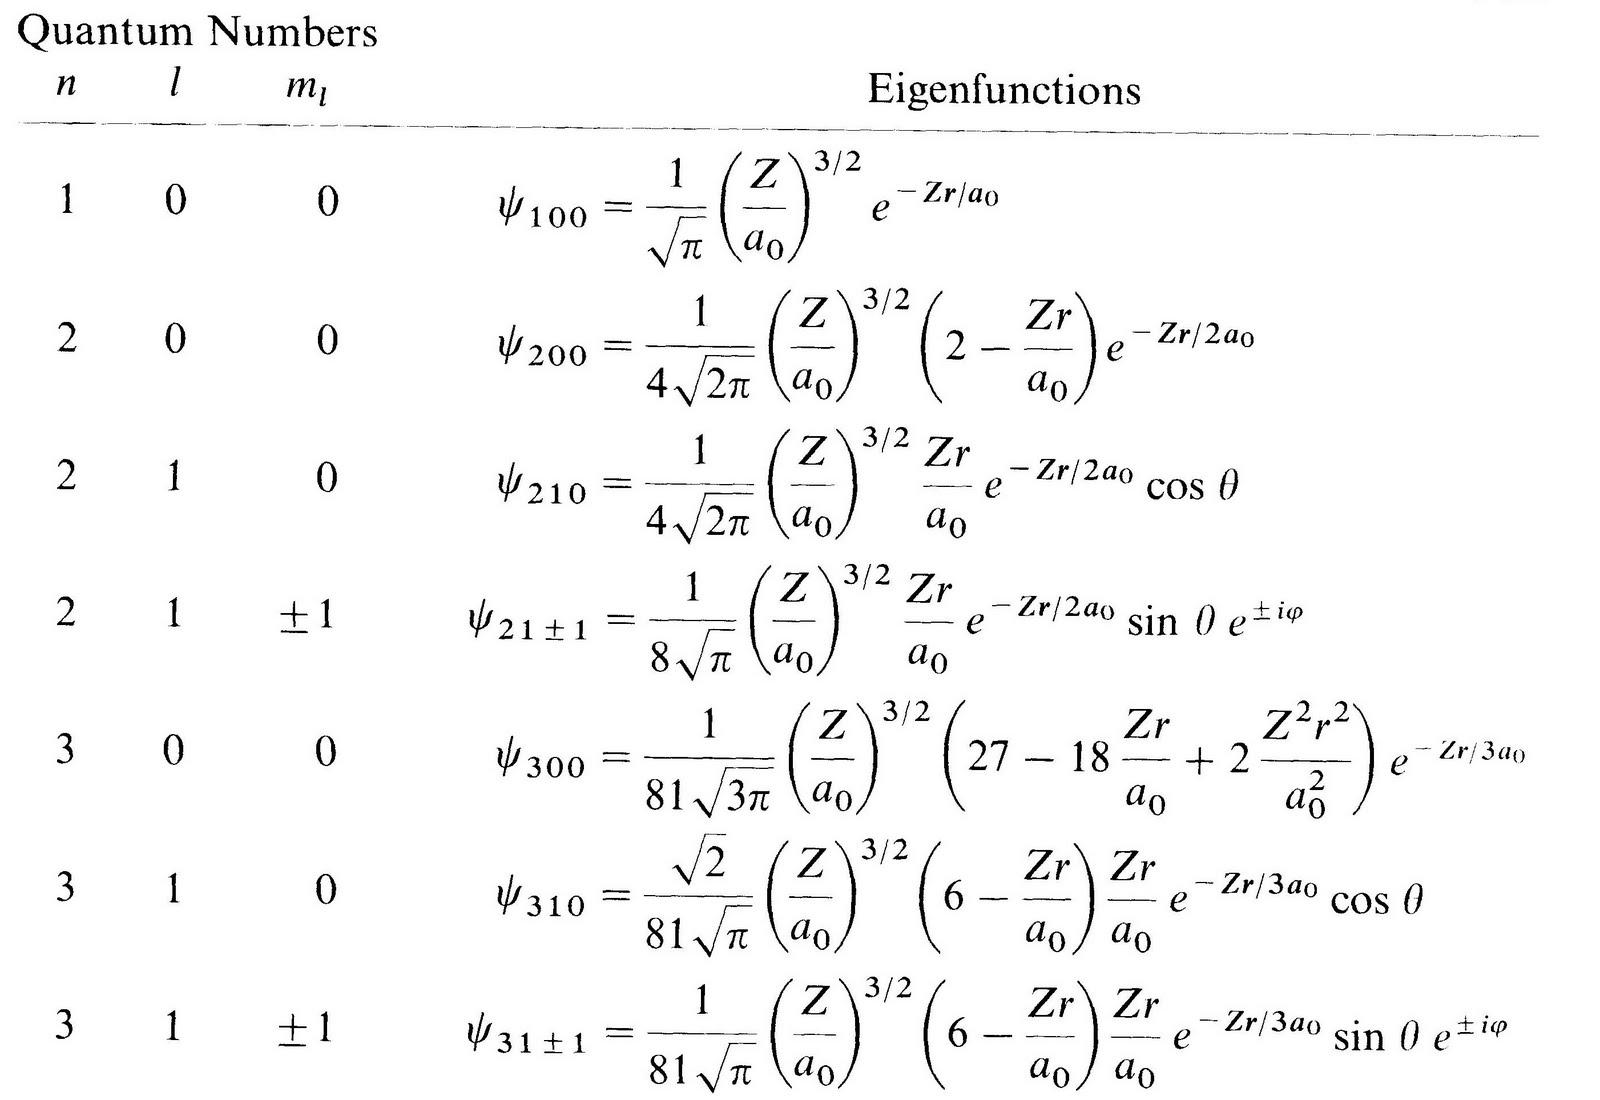 Brane Space An Introduction To Quantum Mechanics 2